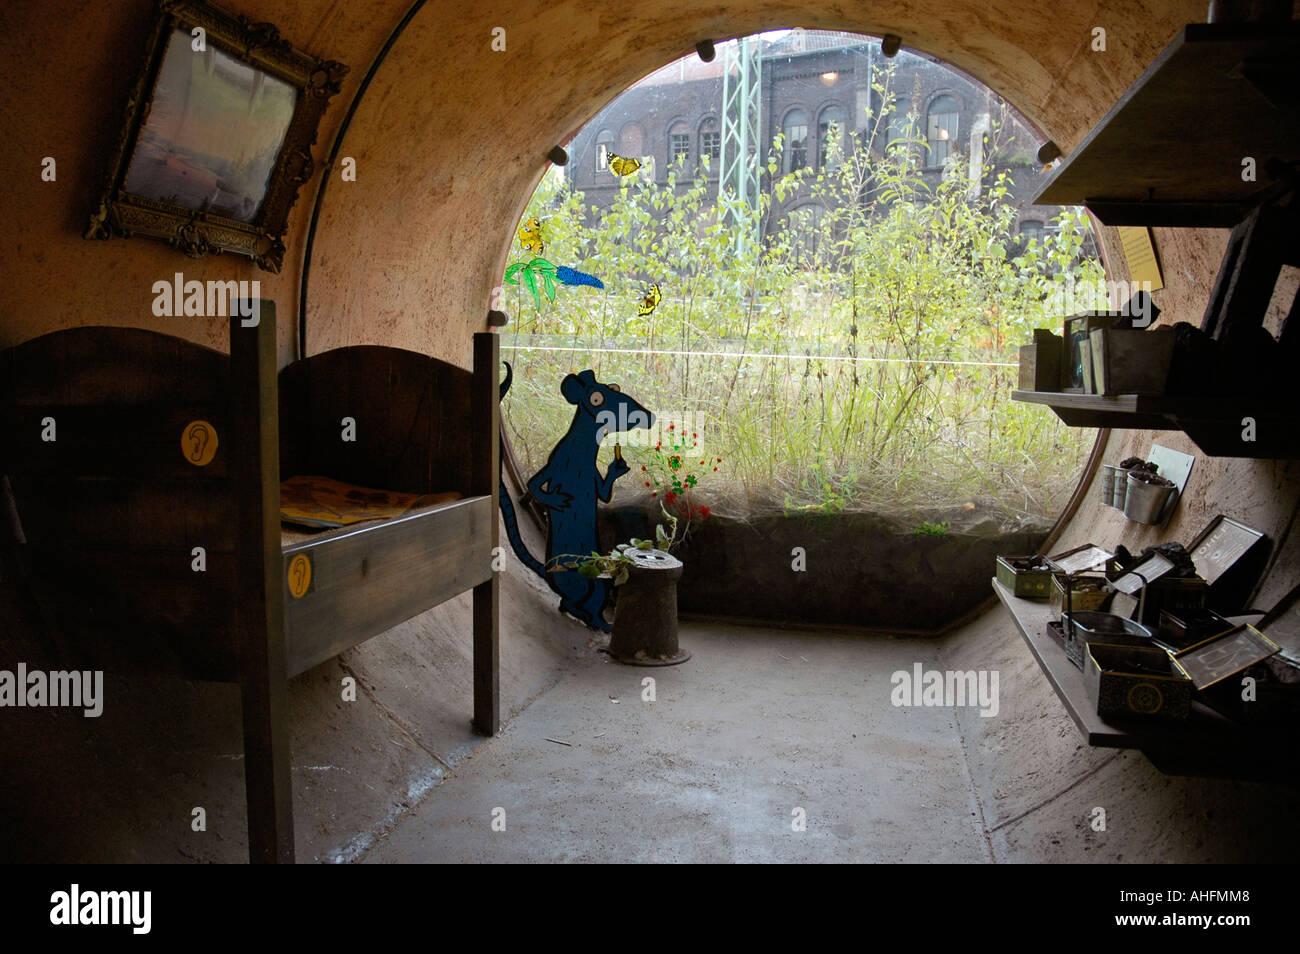 Kids nature trail, rat as a mascot, Henrichshuette Mine, Hattingen, Road of Industry Culture, Ruhr Area, NRW - Stock Image